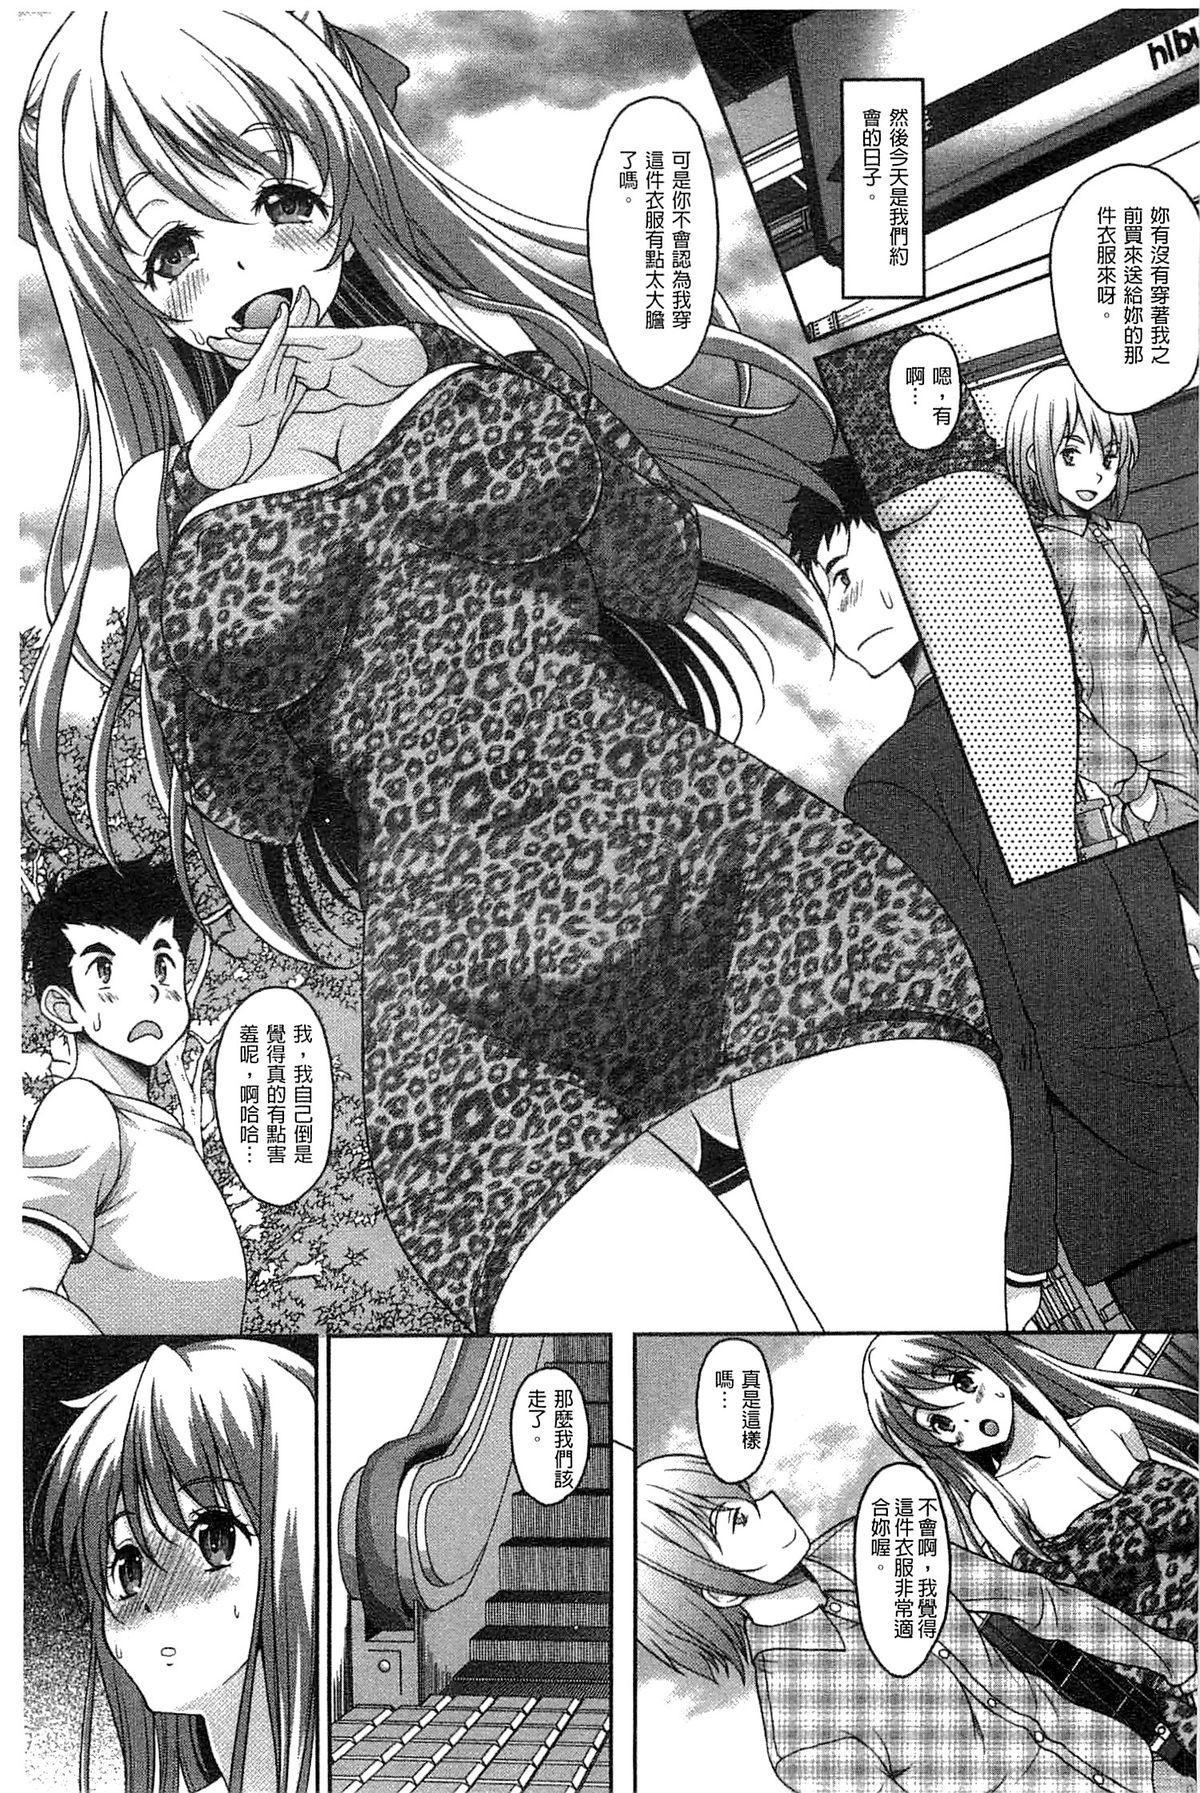 Hajimete nan da kara 34